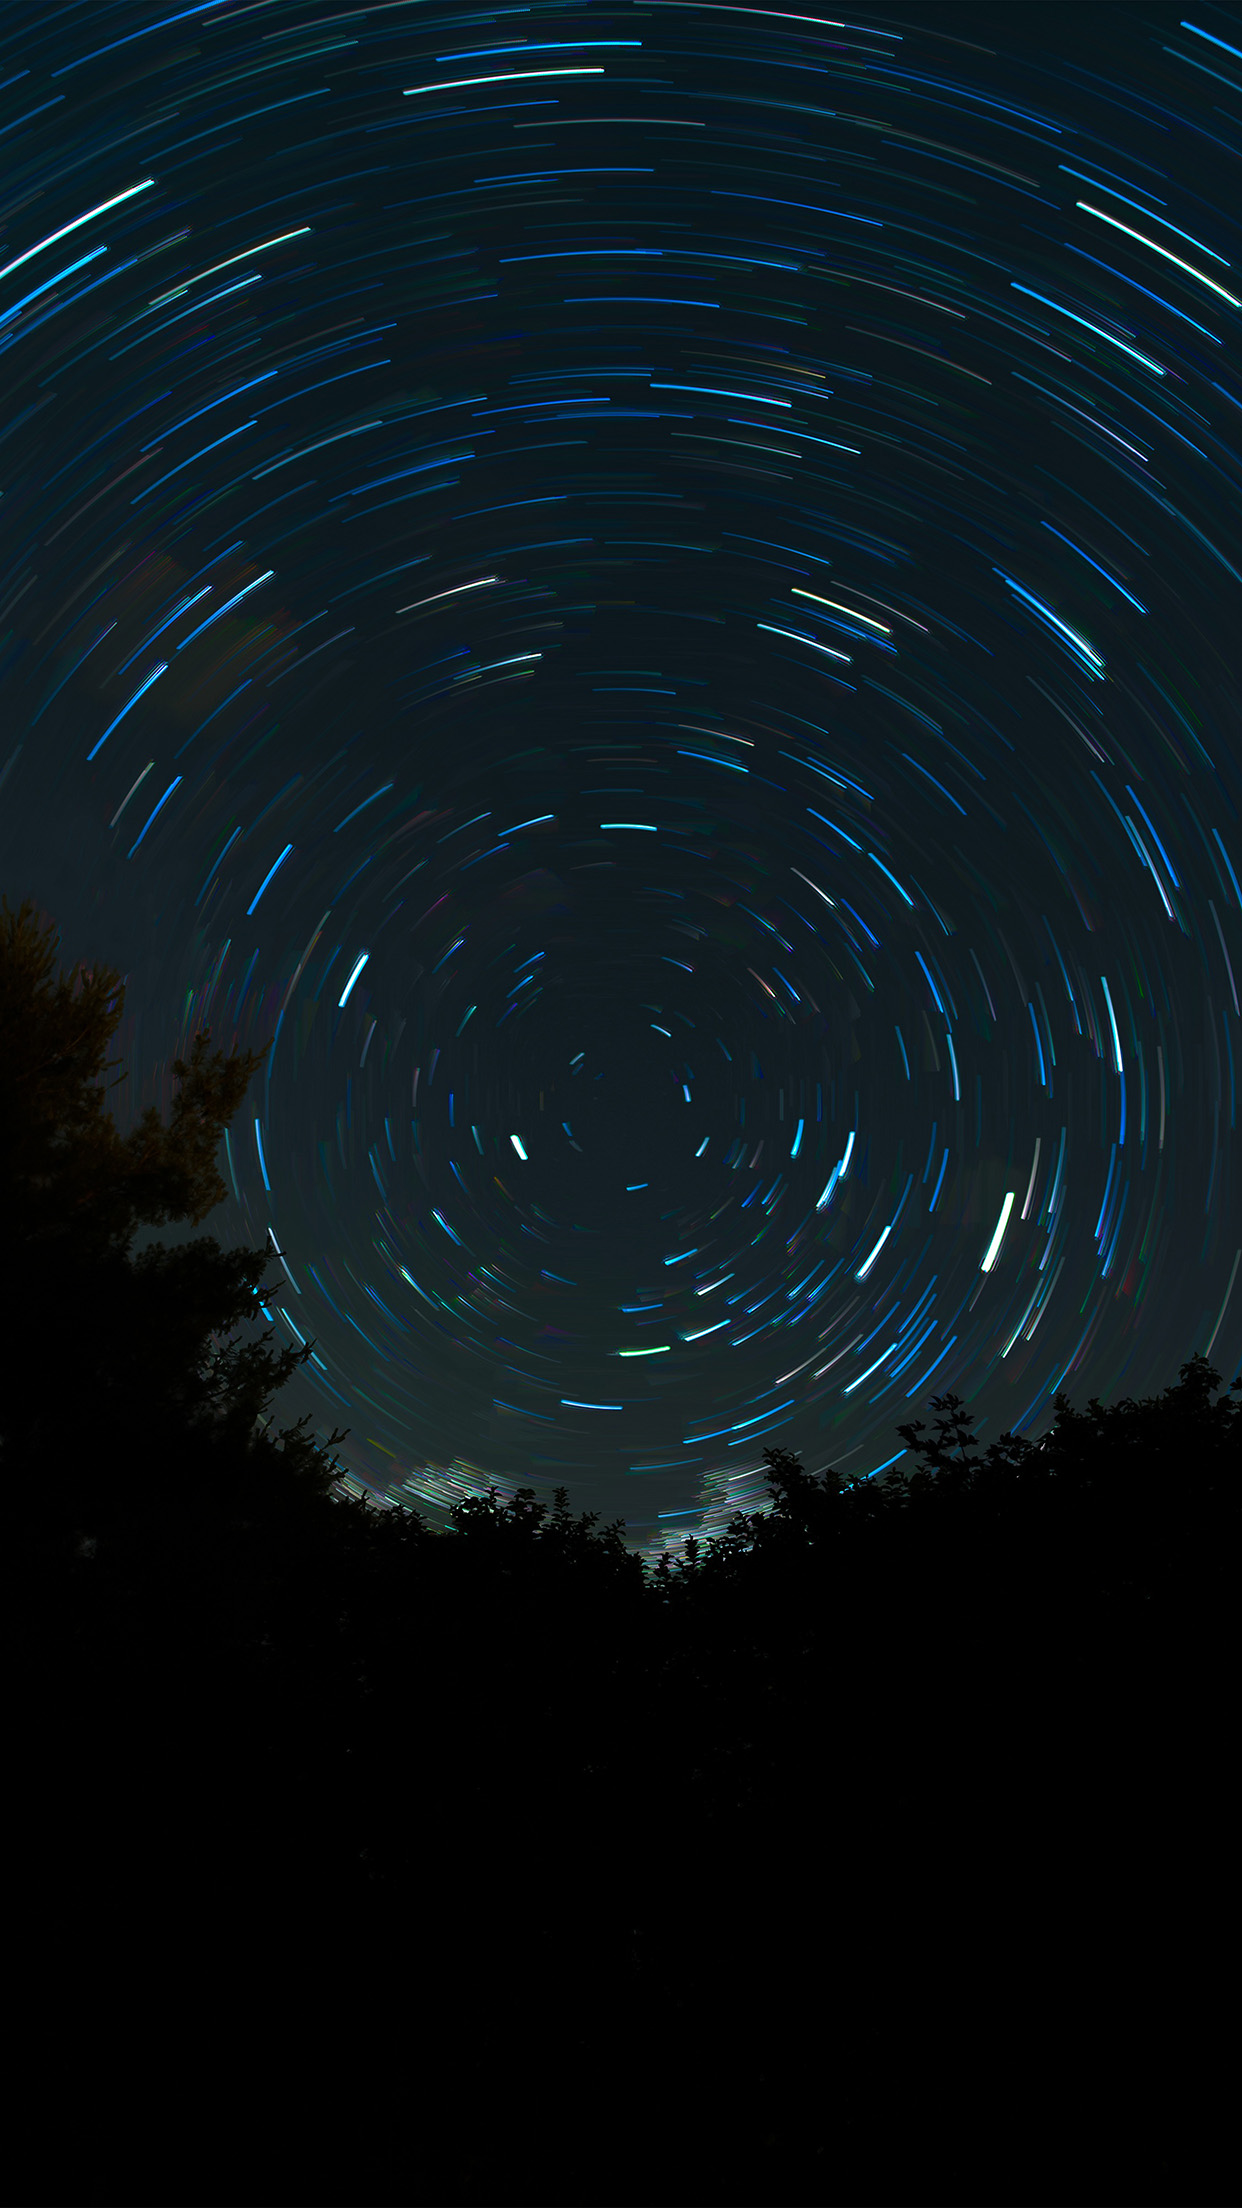 No16 space night sky circle dark wallpaper - Space night sky wallpaper ...